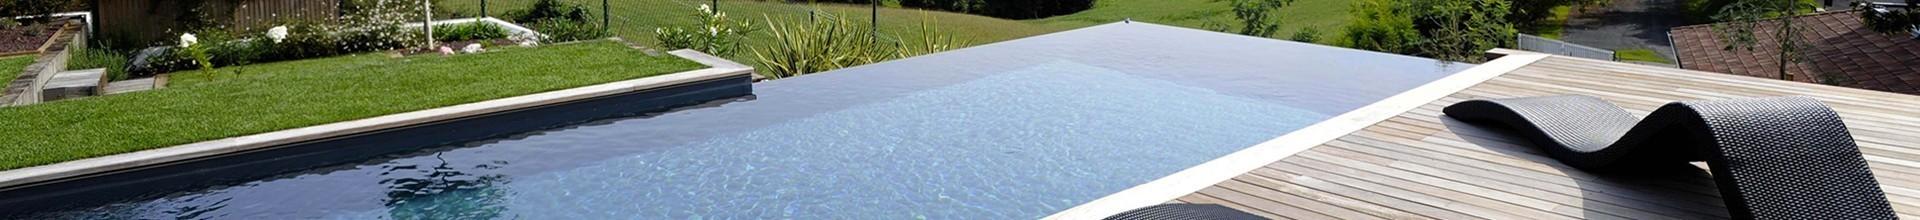 Direct usine, piscine coque prix Normandie